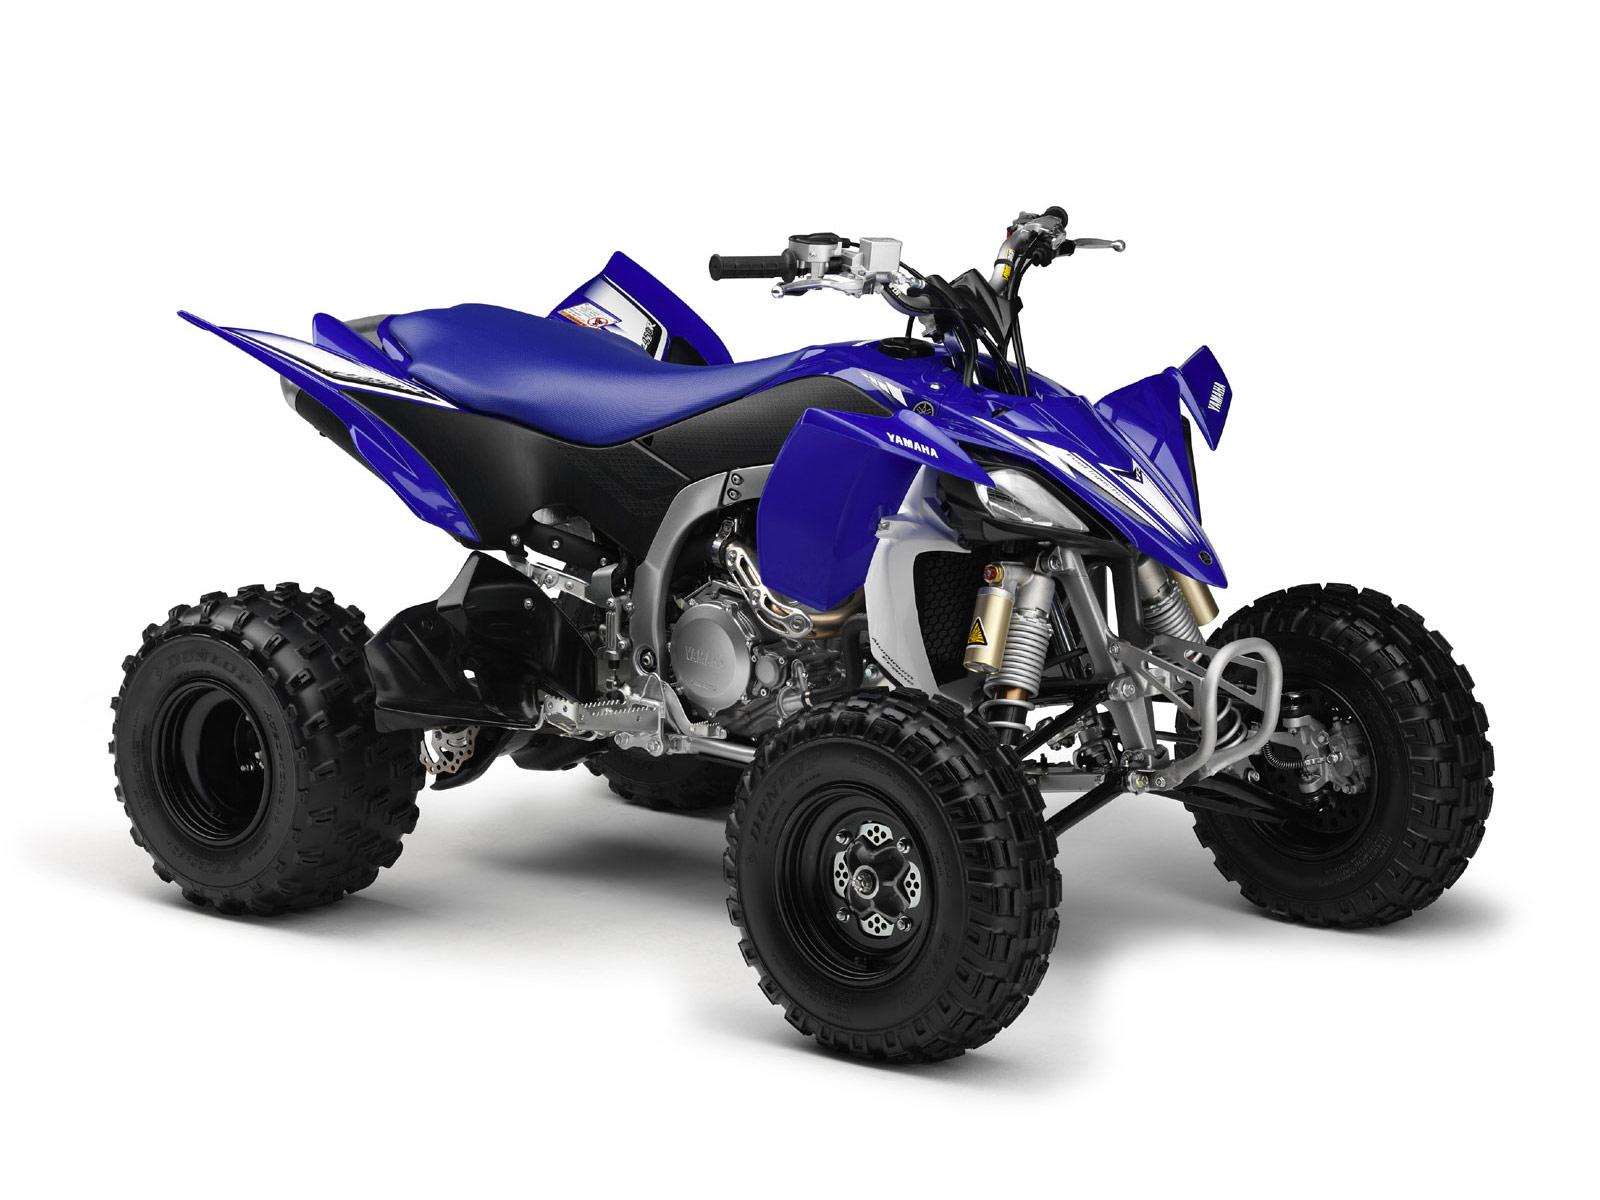 Yamaha Yfz450r Atv Pictures